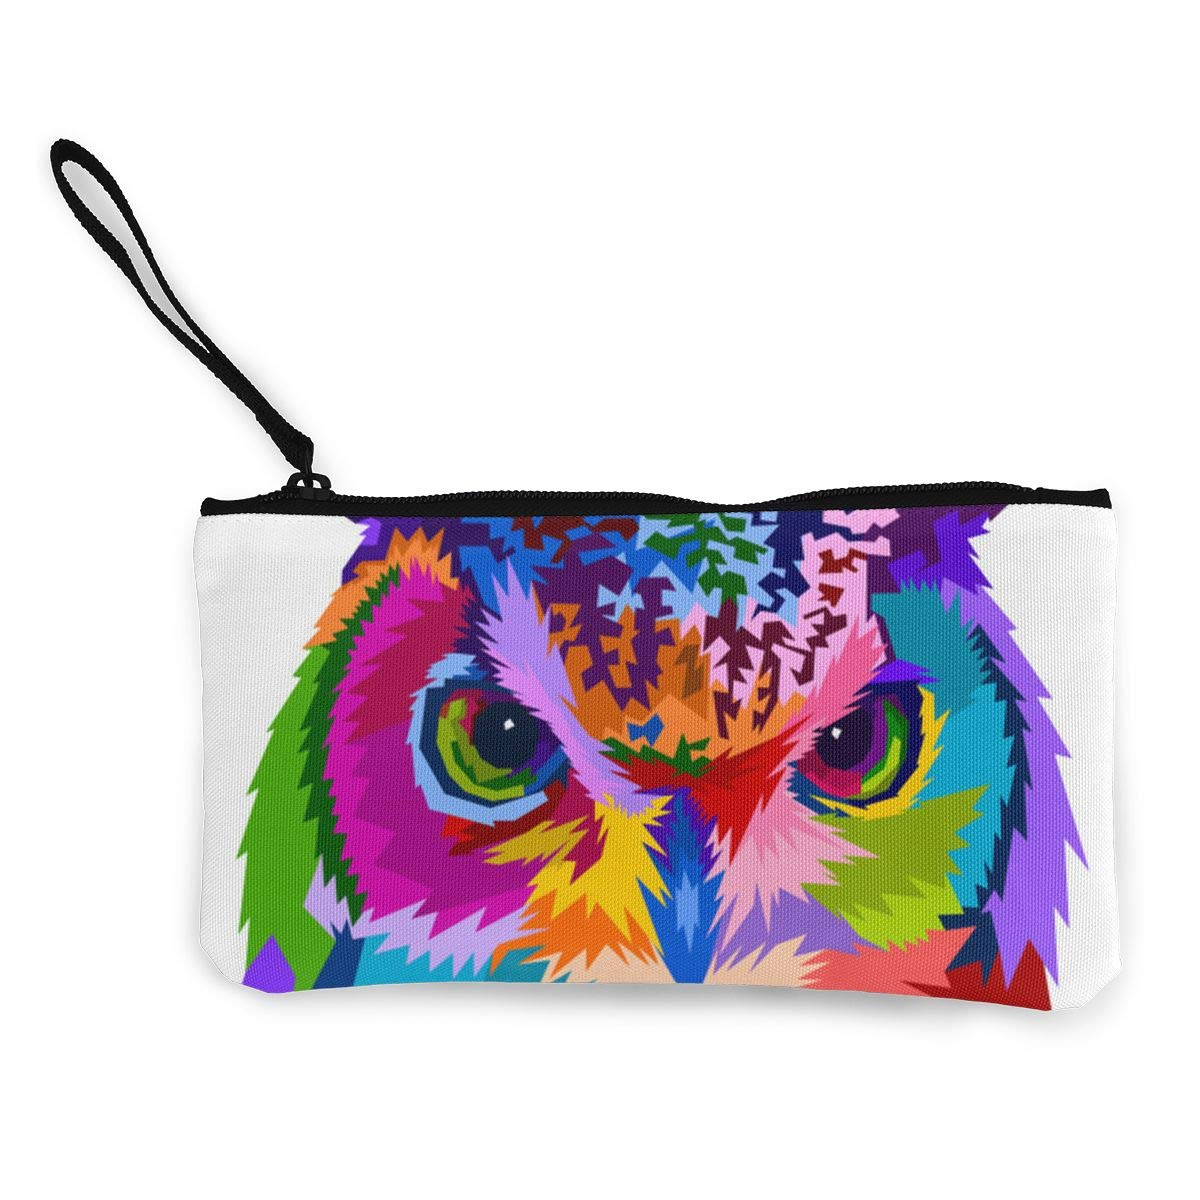 3fd2772a06 Colorful Owl Cute Canvas Change Cash Coin Purse